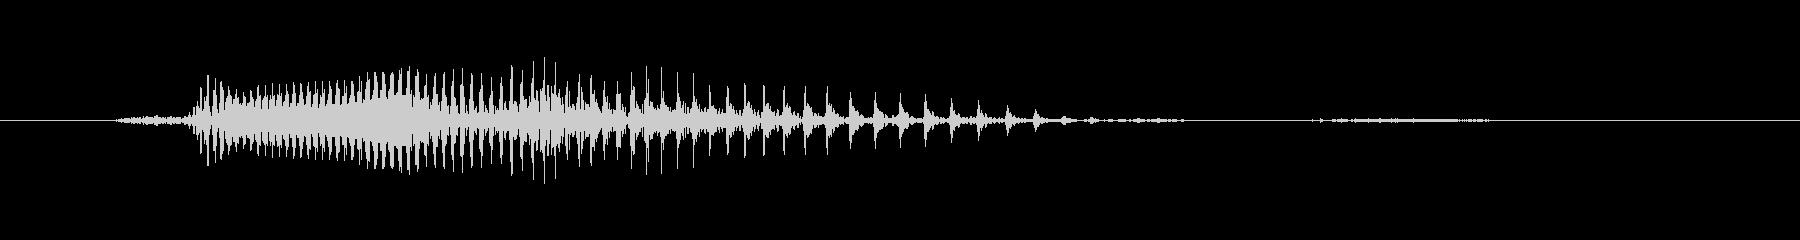 point(低音)の未再生の波形